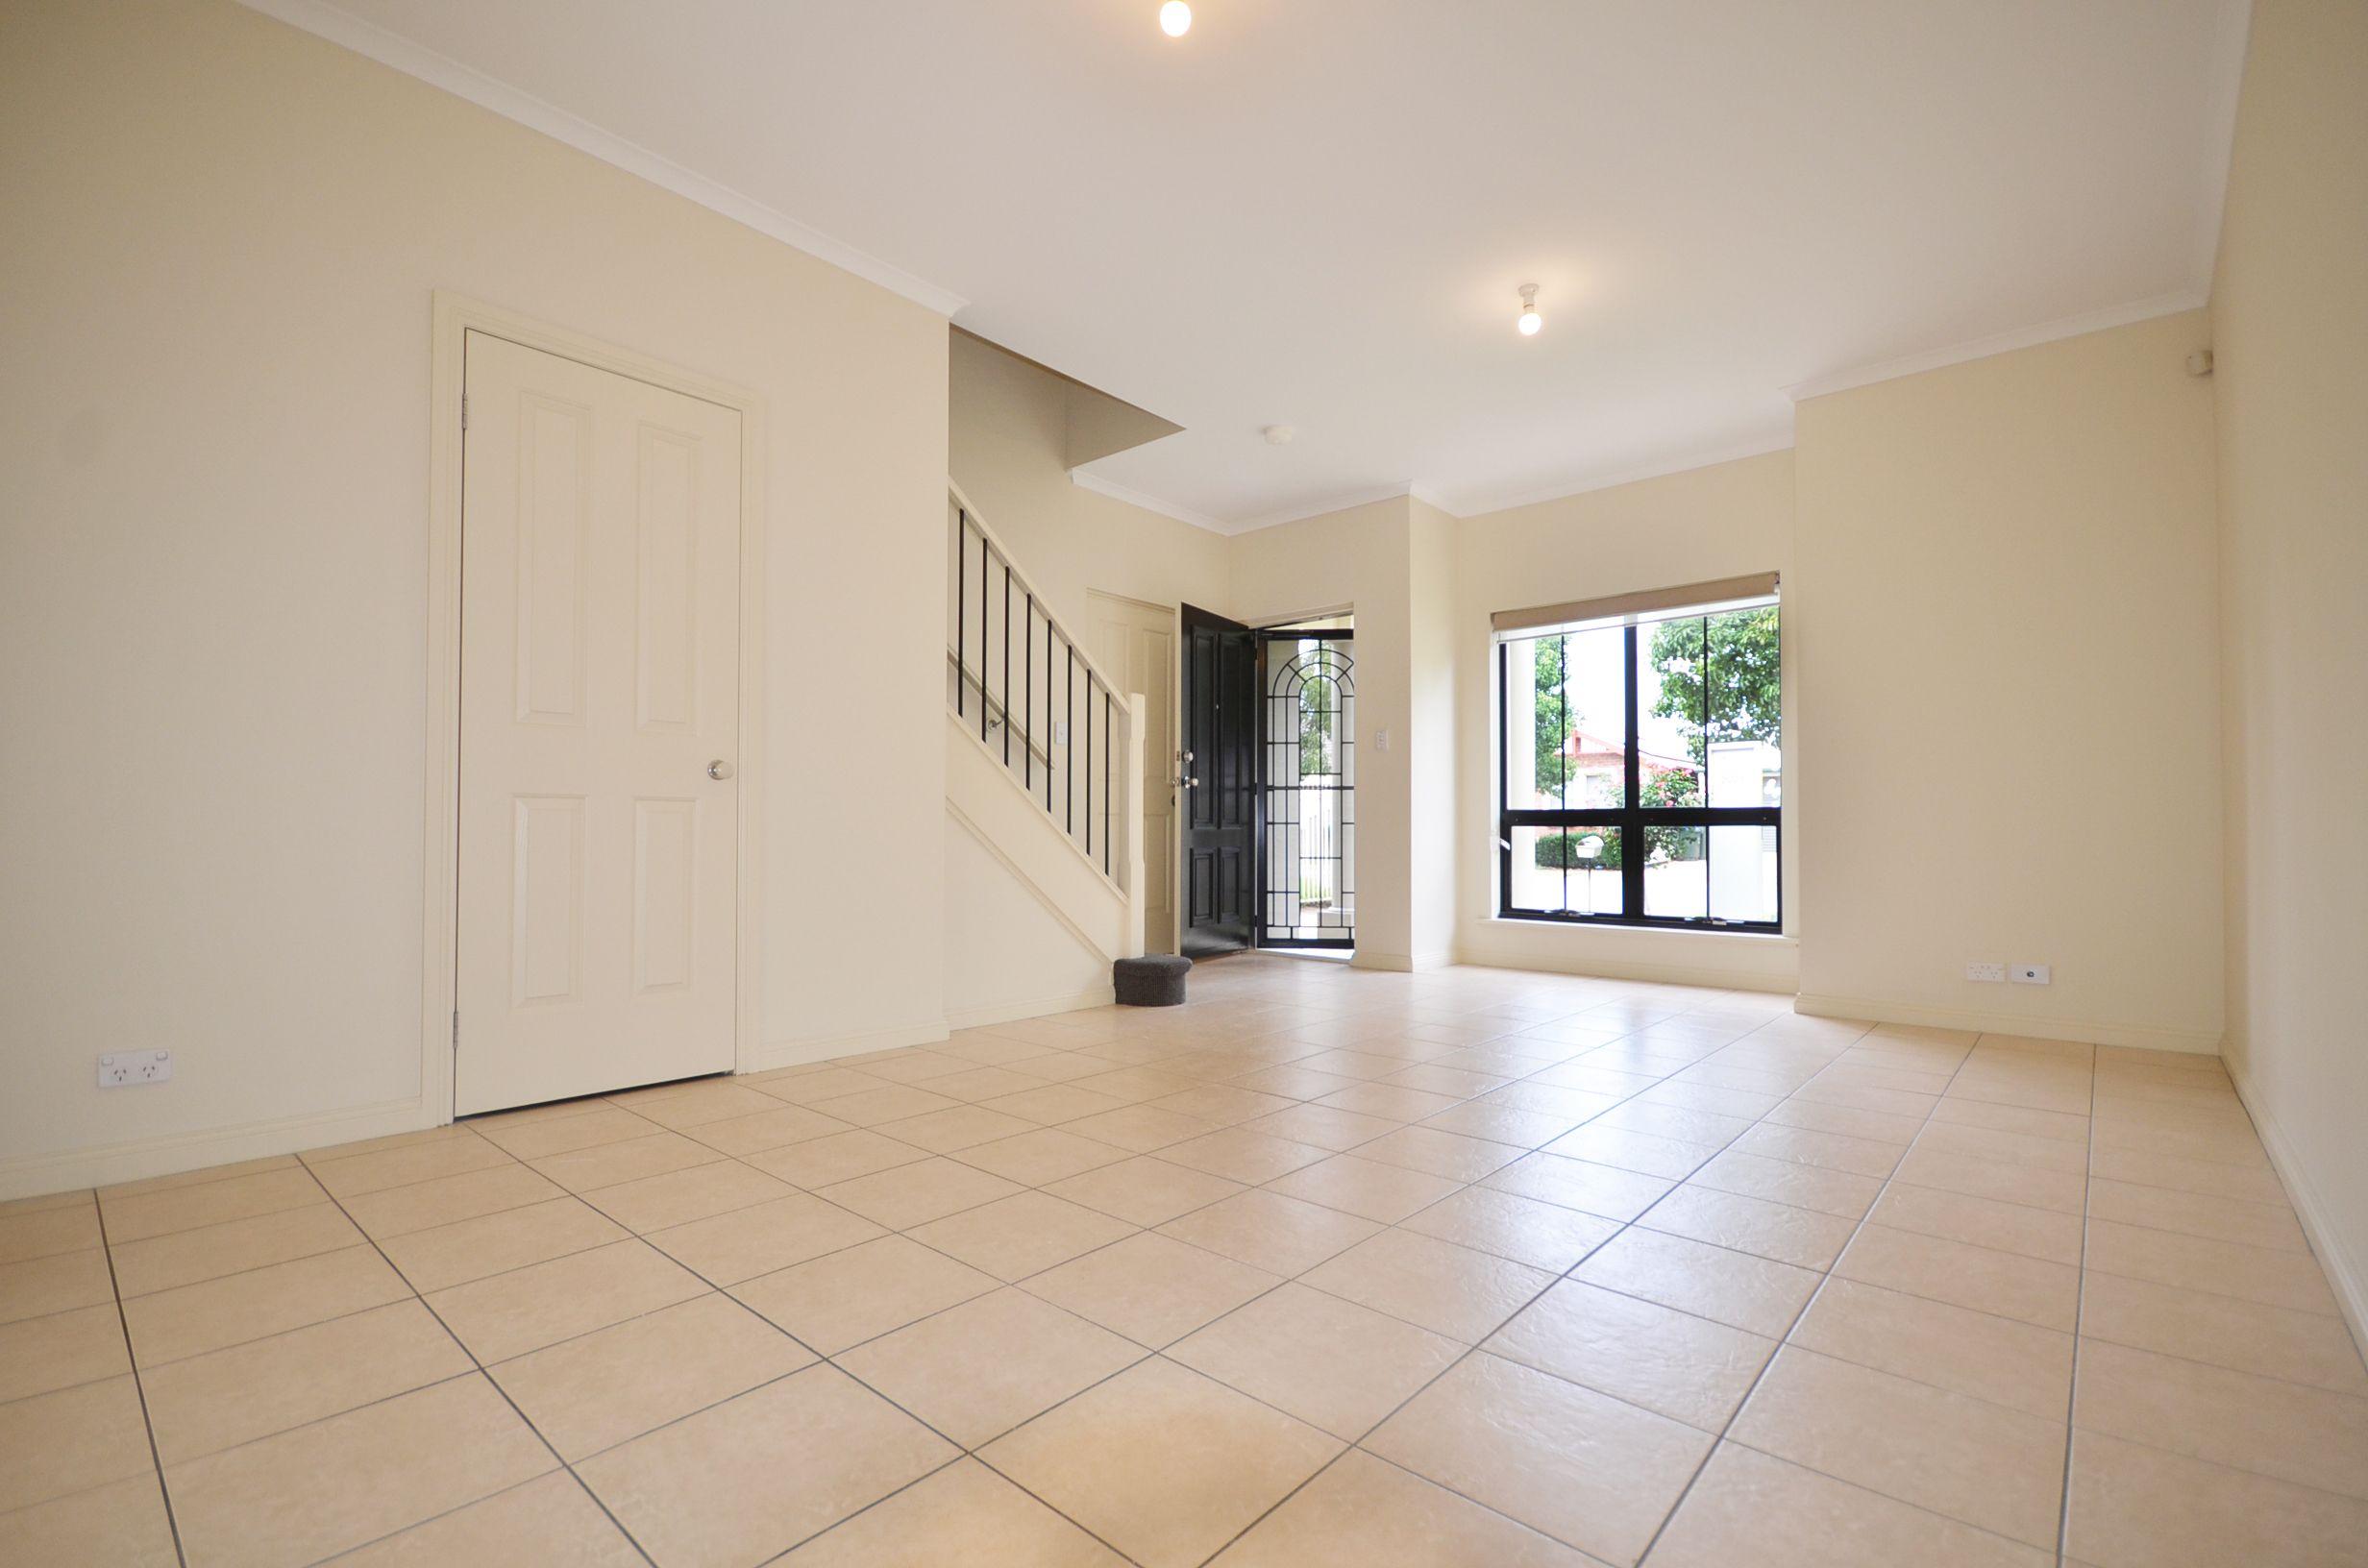 23 Monmouth Street, Ridleyton SA 5008